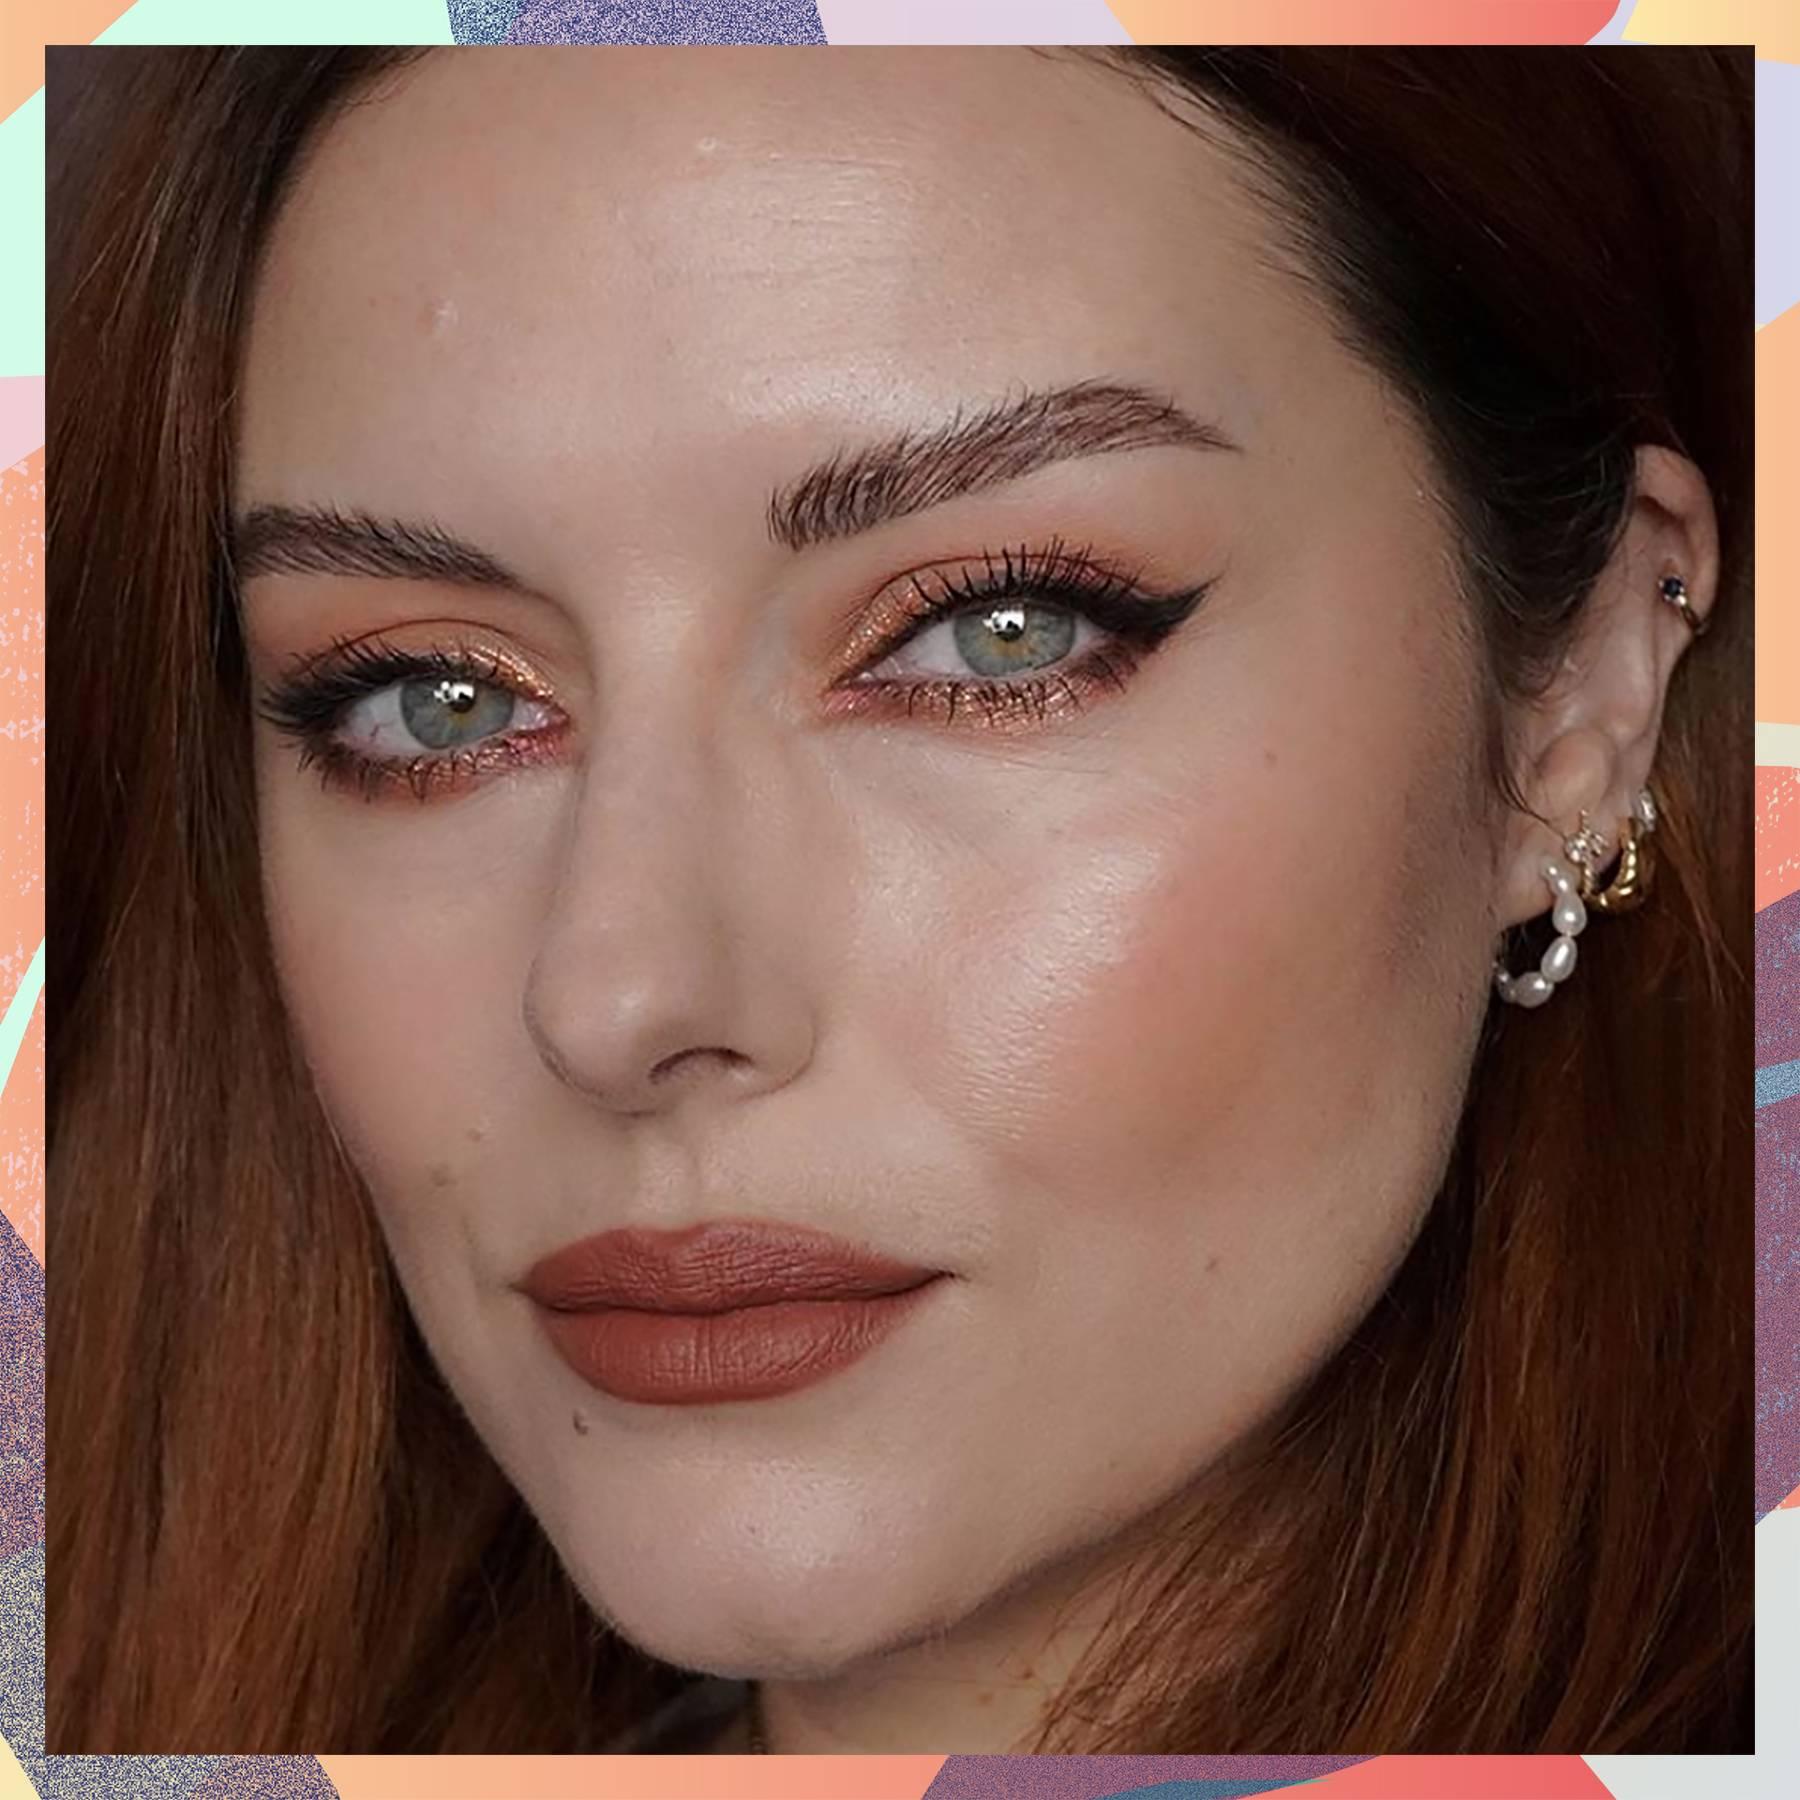 Instagram's favourite makeup artist, Katie Jane Hughes, shares her insider tips and next major beauty trends